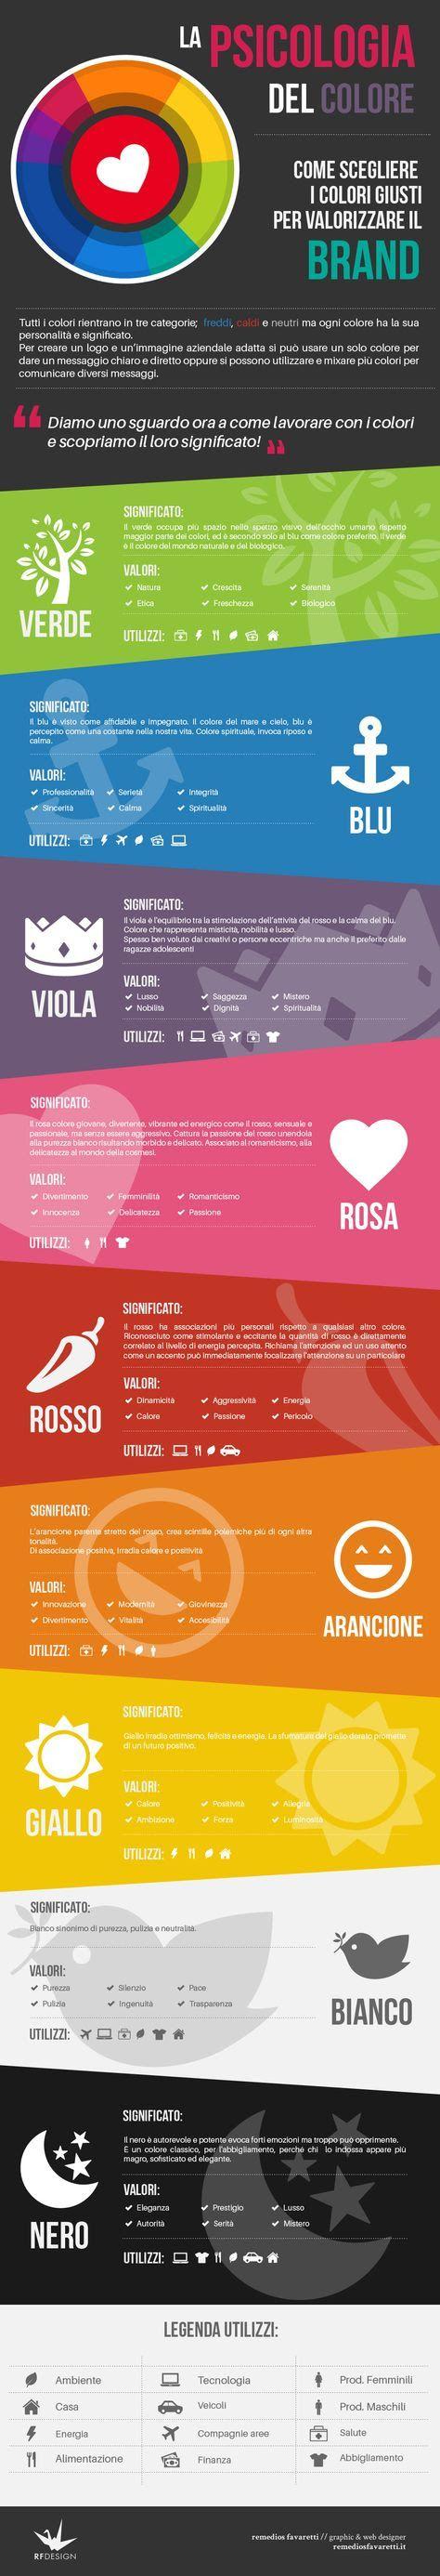 Inbox – gennaro.castagna1@gmail.com